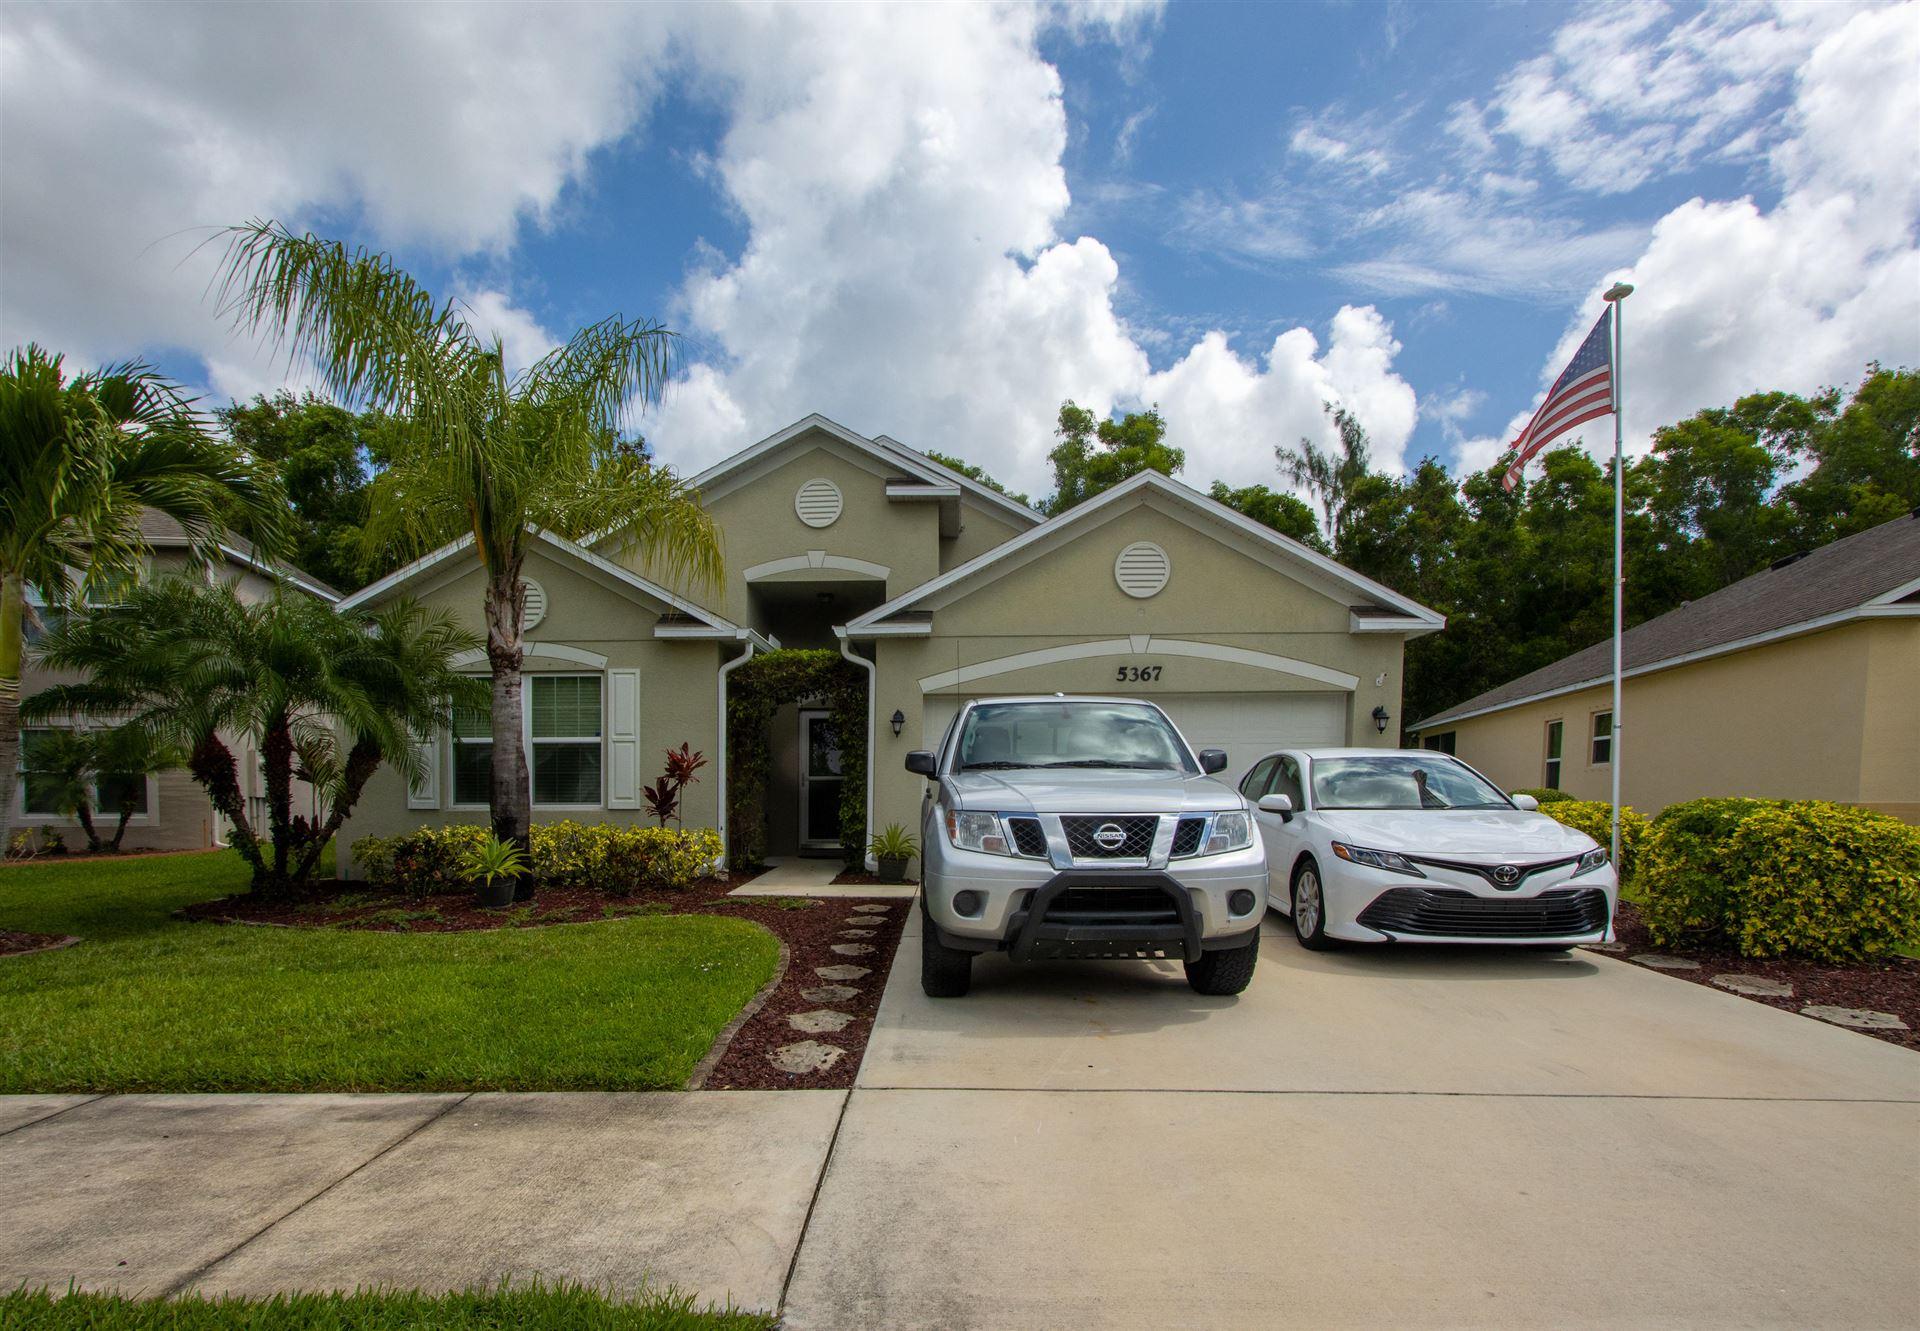 5367 NW Wisk Fern Circle, Port Saint Lucie, FL 34986 - MLS#: RX-10722873